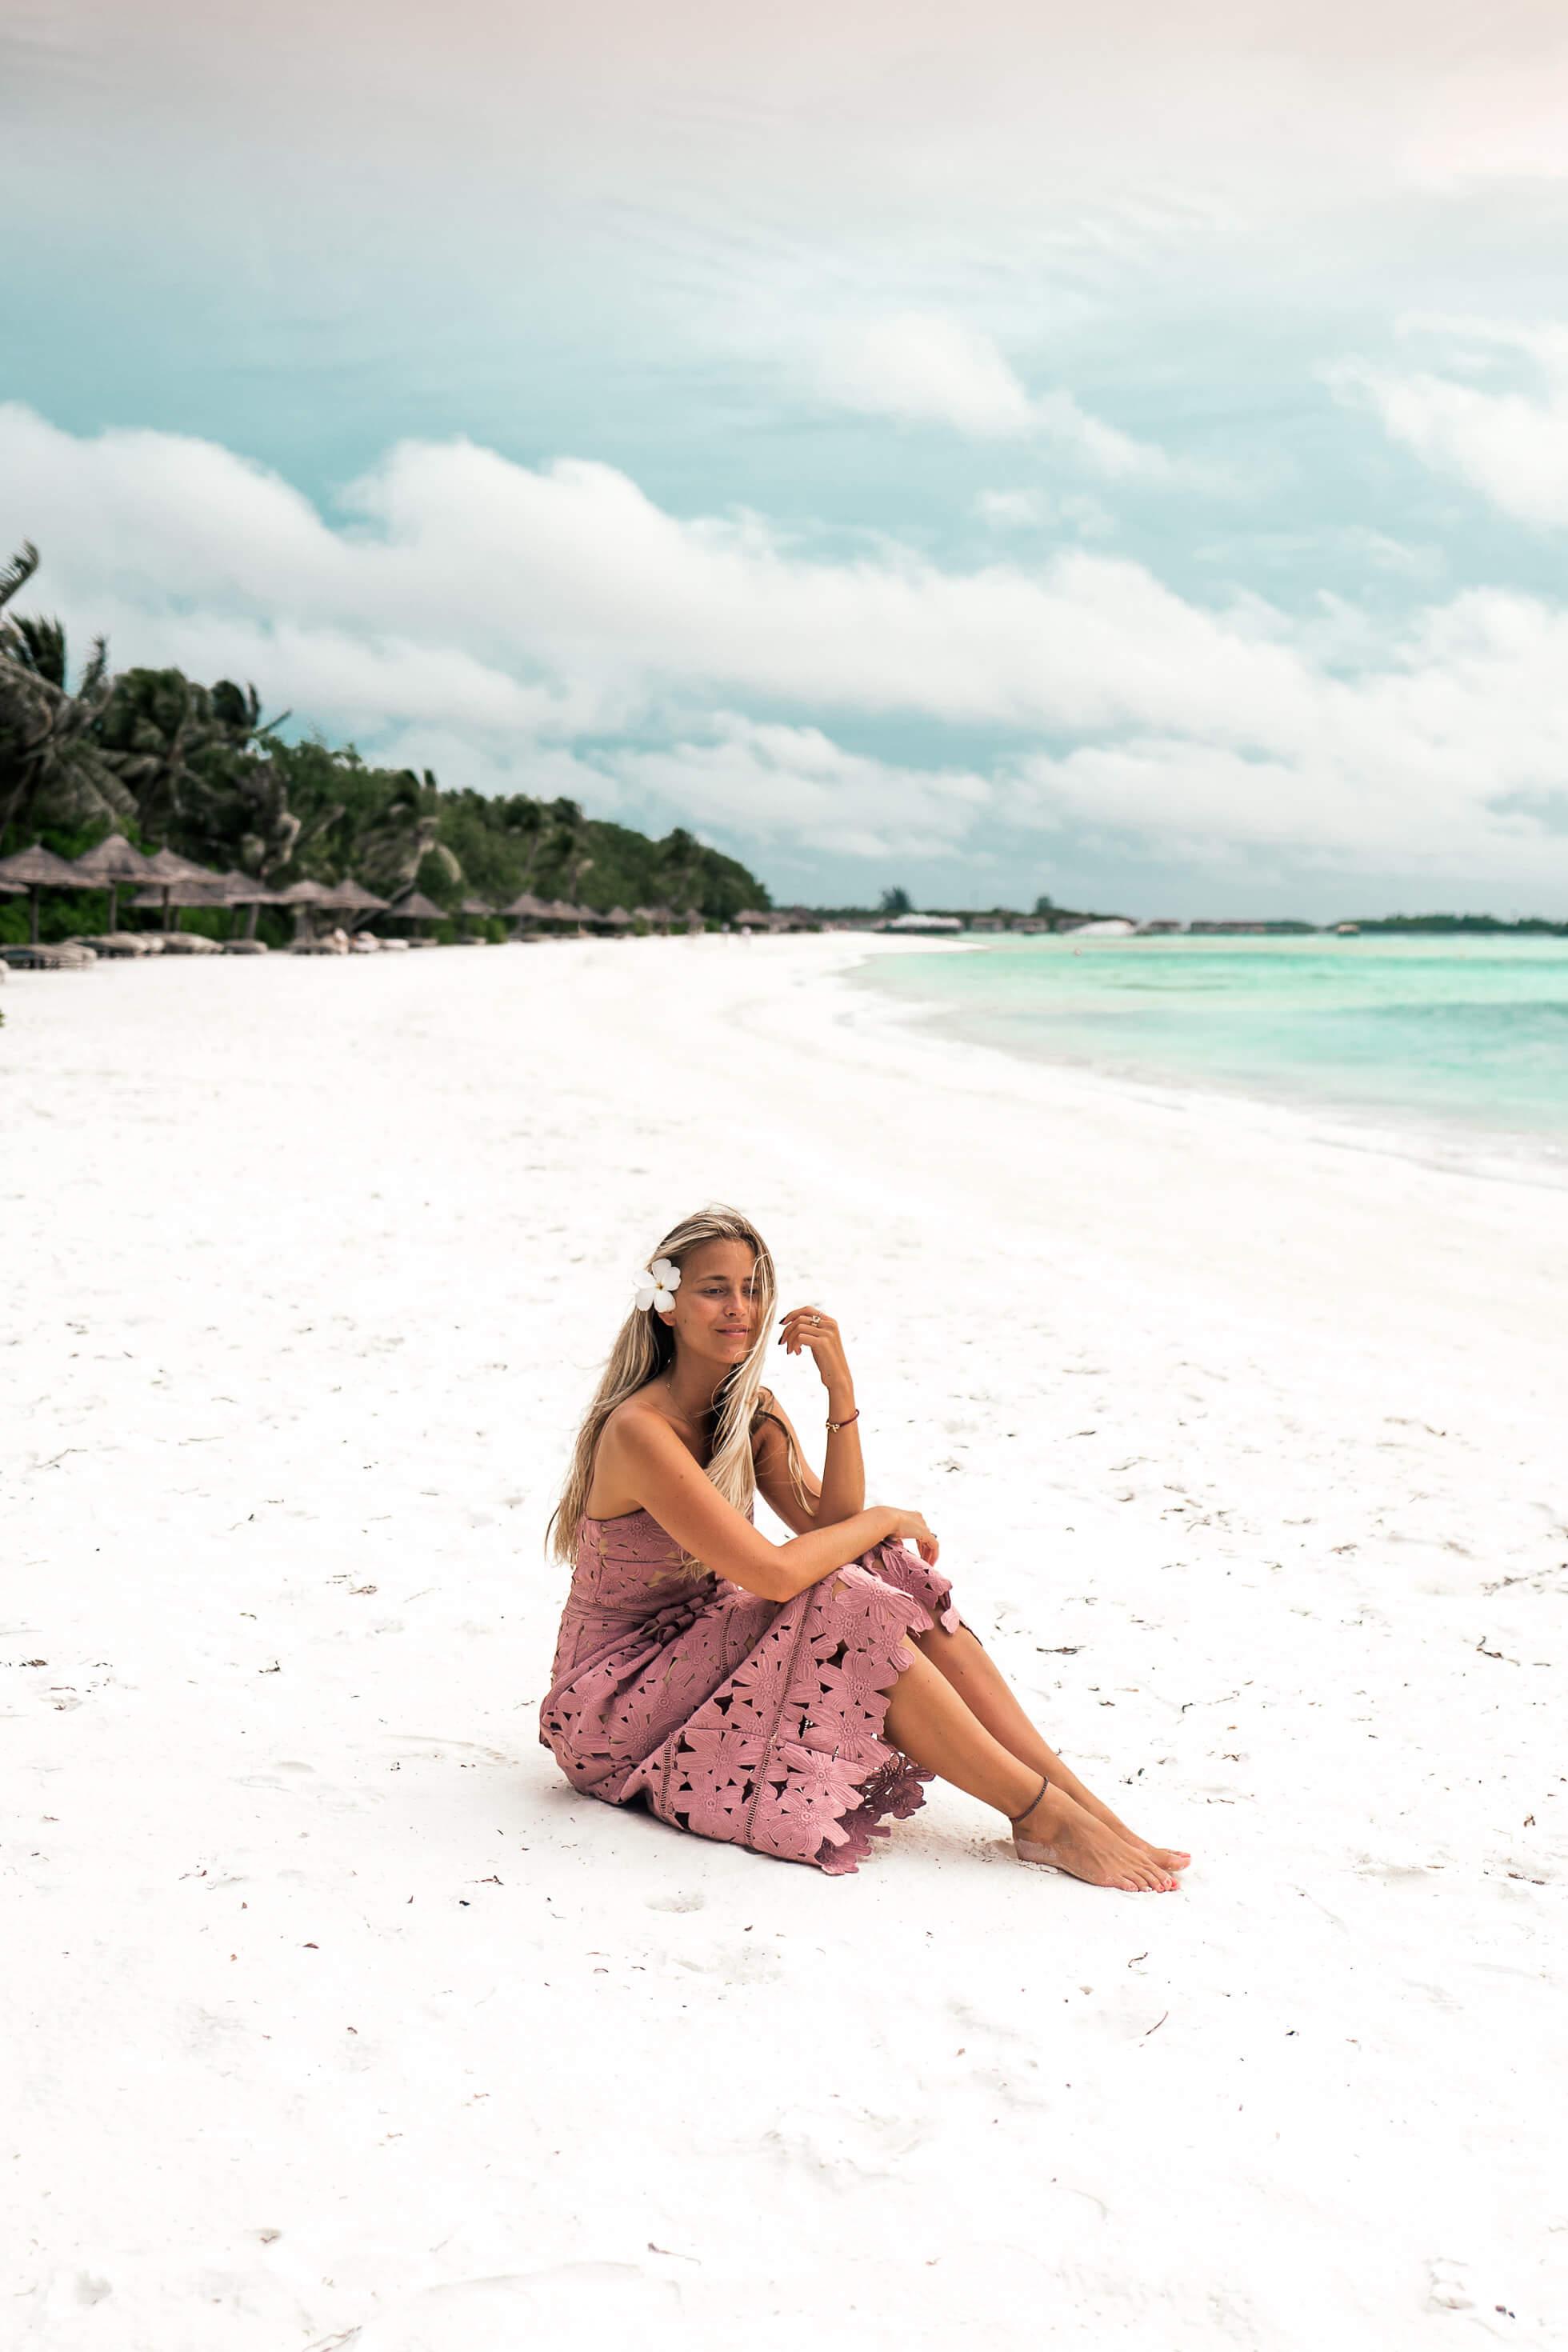 janni-deler-flower-dress-maldivesl1140940-redigera